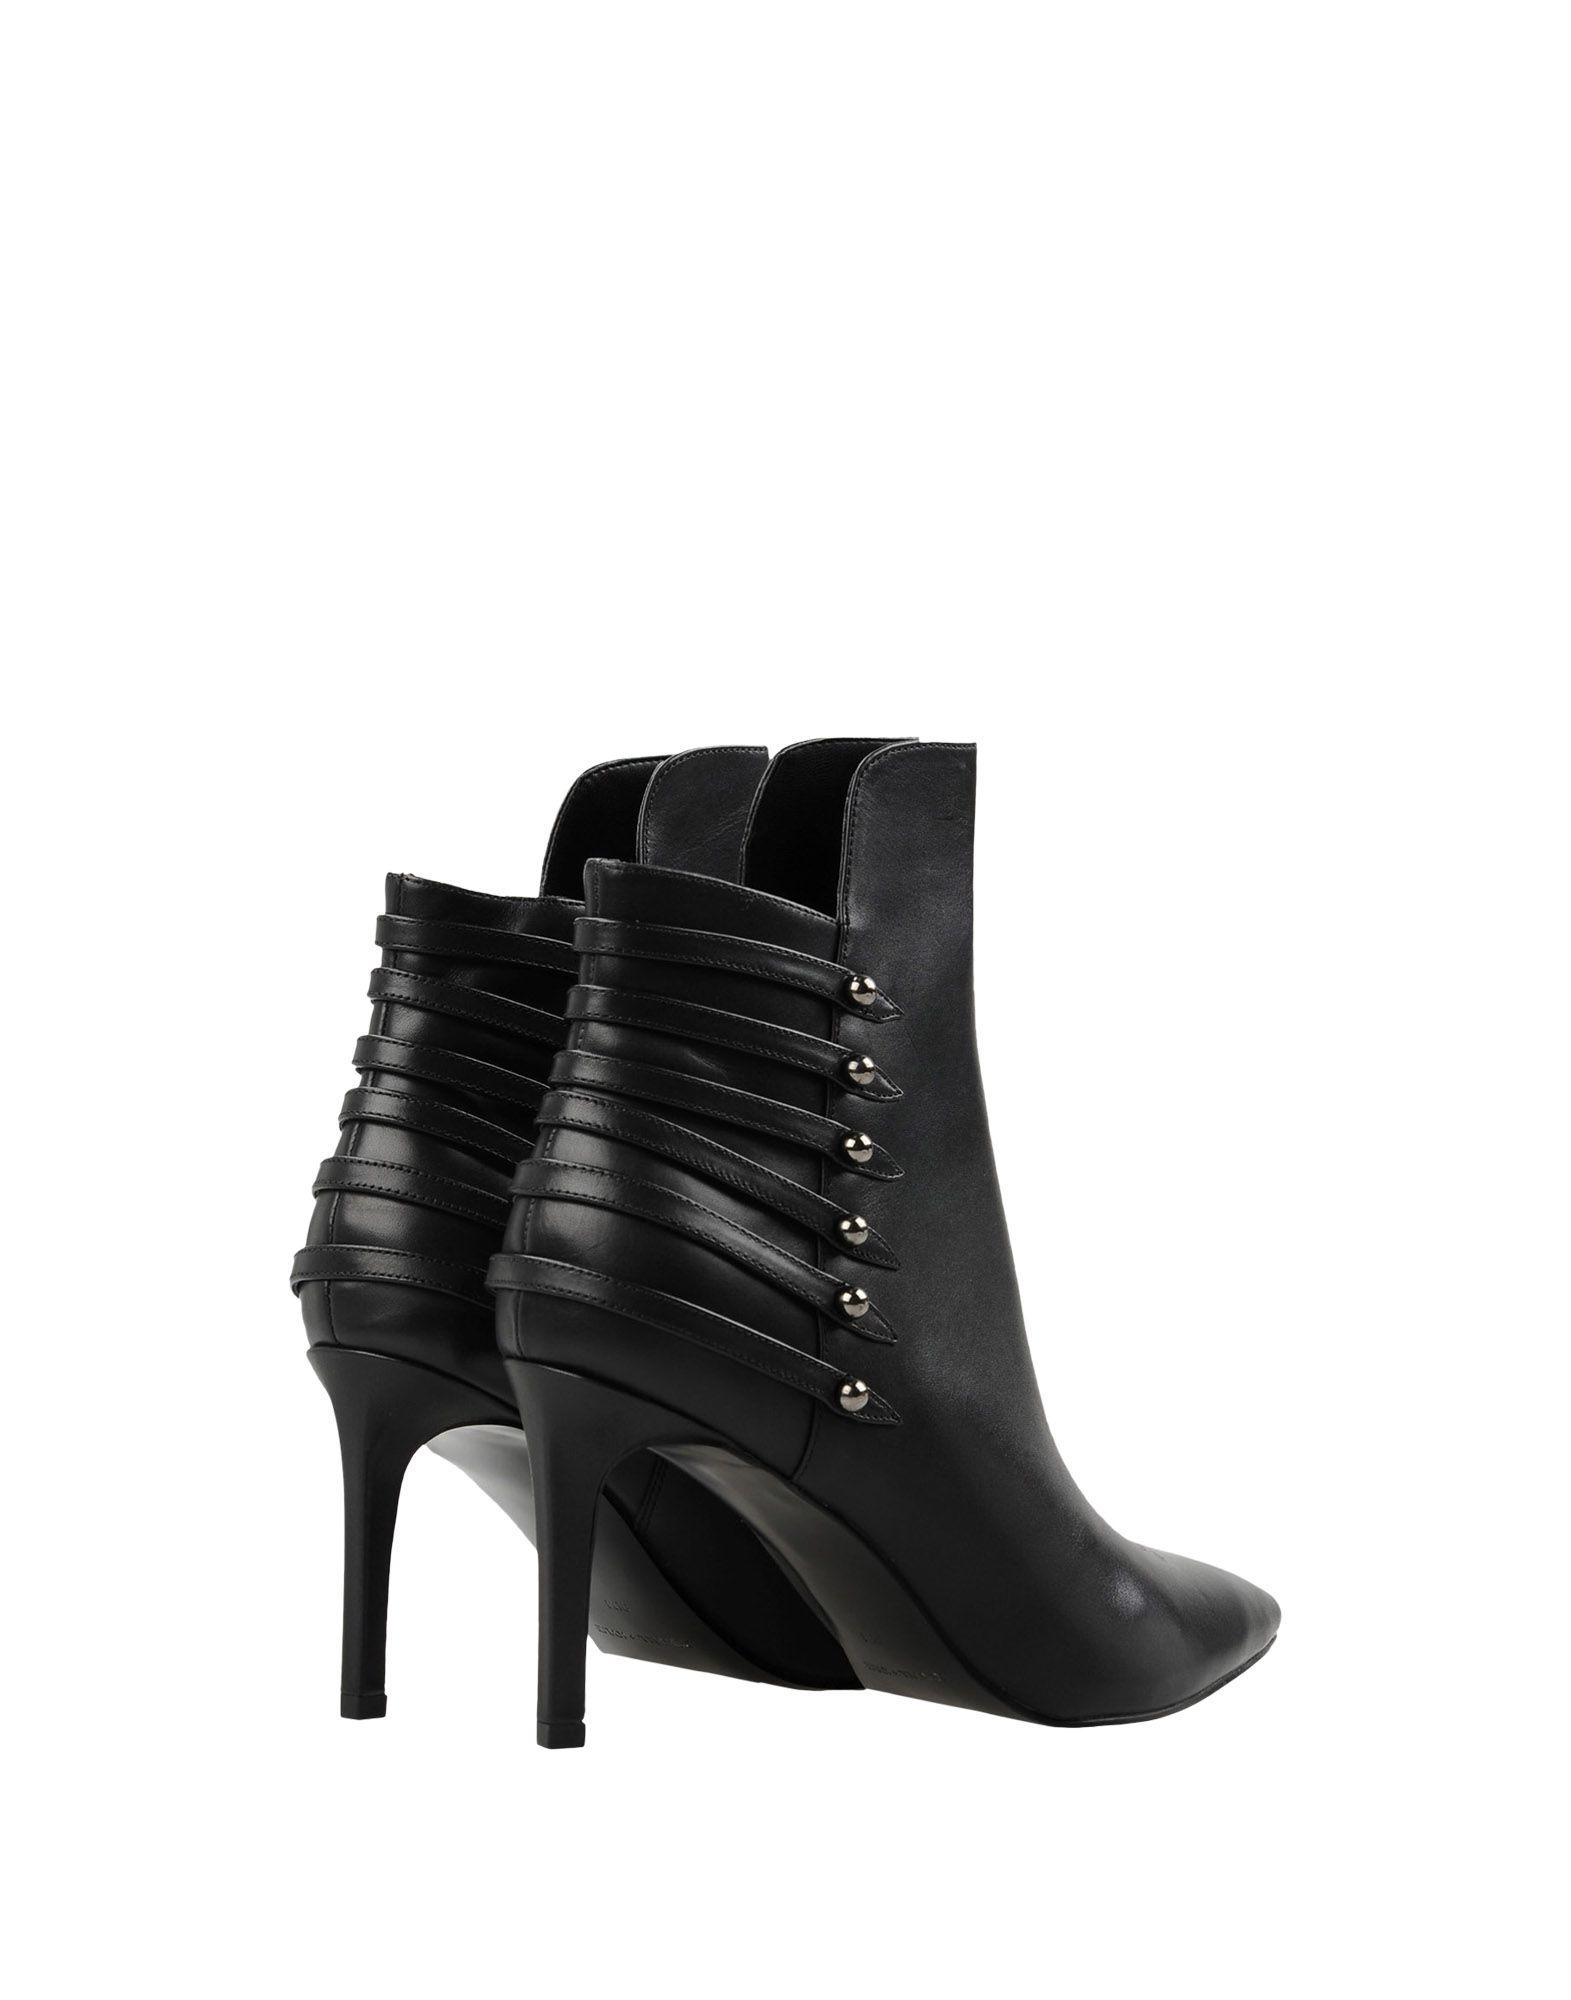 Kendall + Kylie Stiefelette strapazierfähige Damen  11324206GIGut aussehende strapazierfähige Stiefelette Schuhe f5ee04